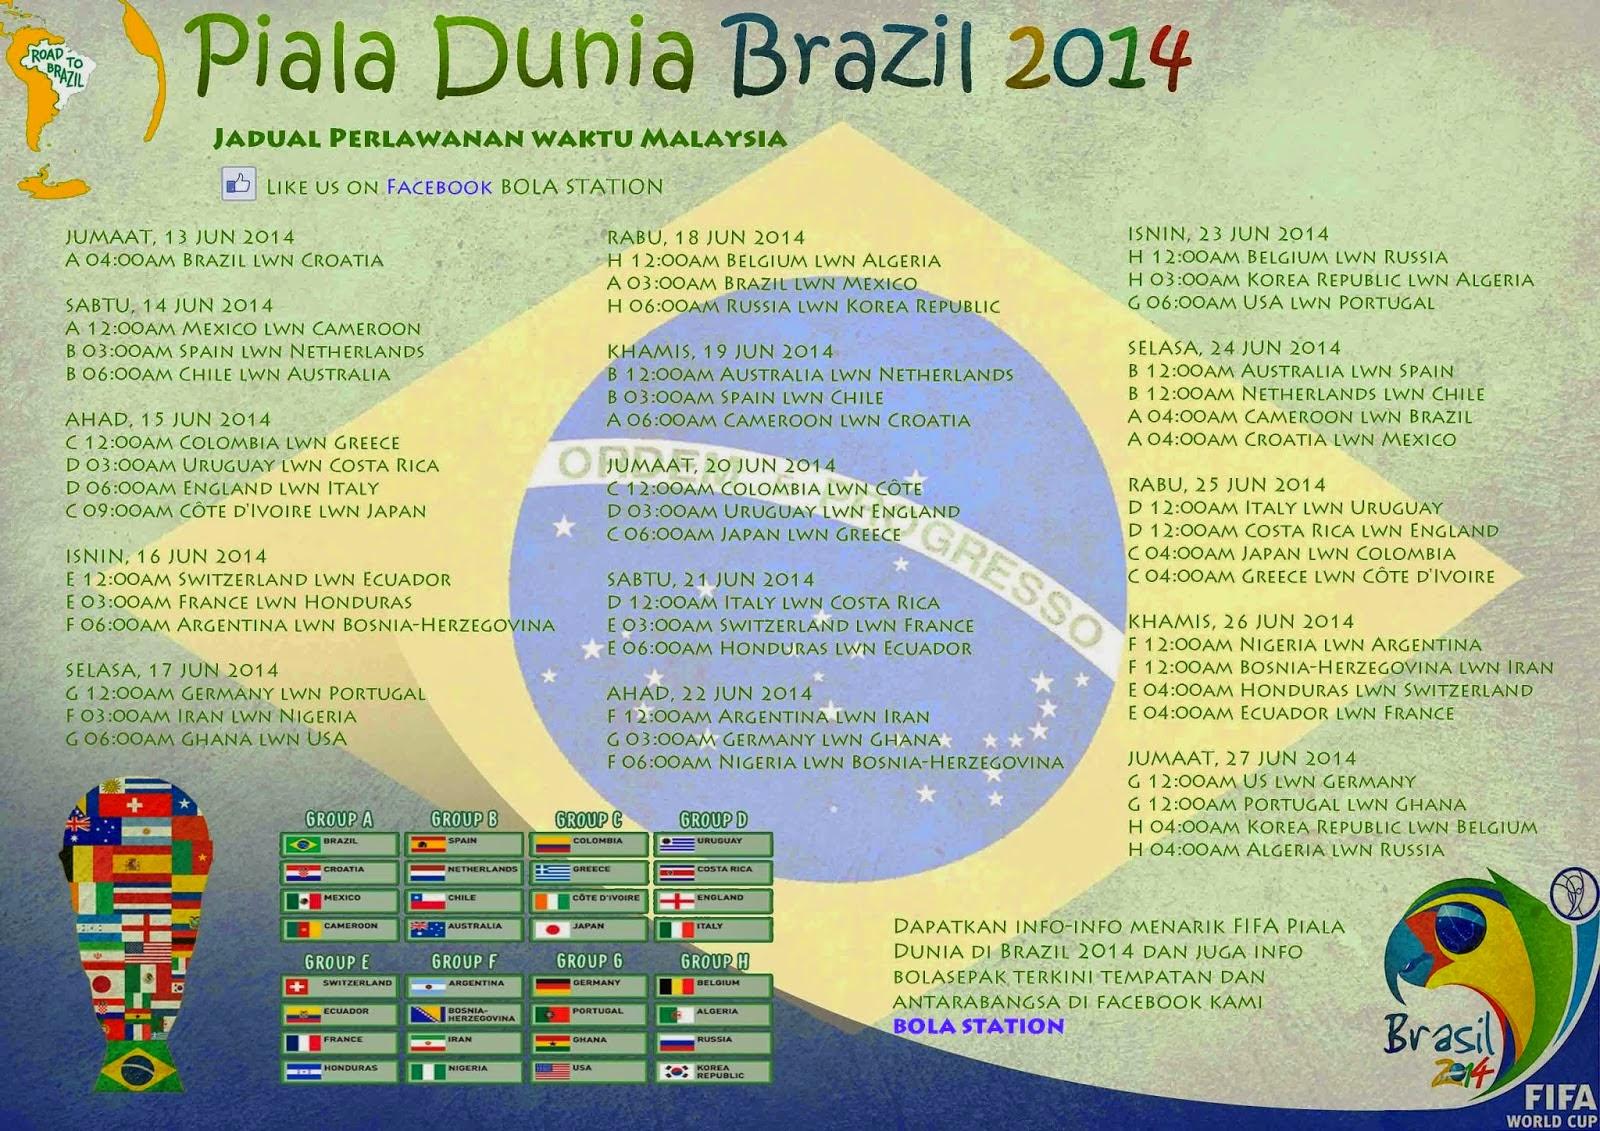 Bola Sepak Piala Dunia 2014 Waktu Malaysia | World Cup Brazil